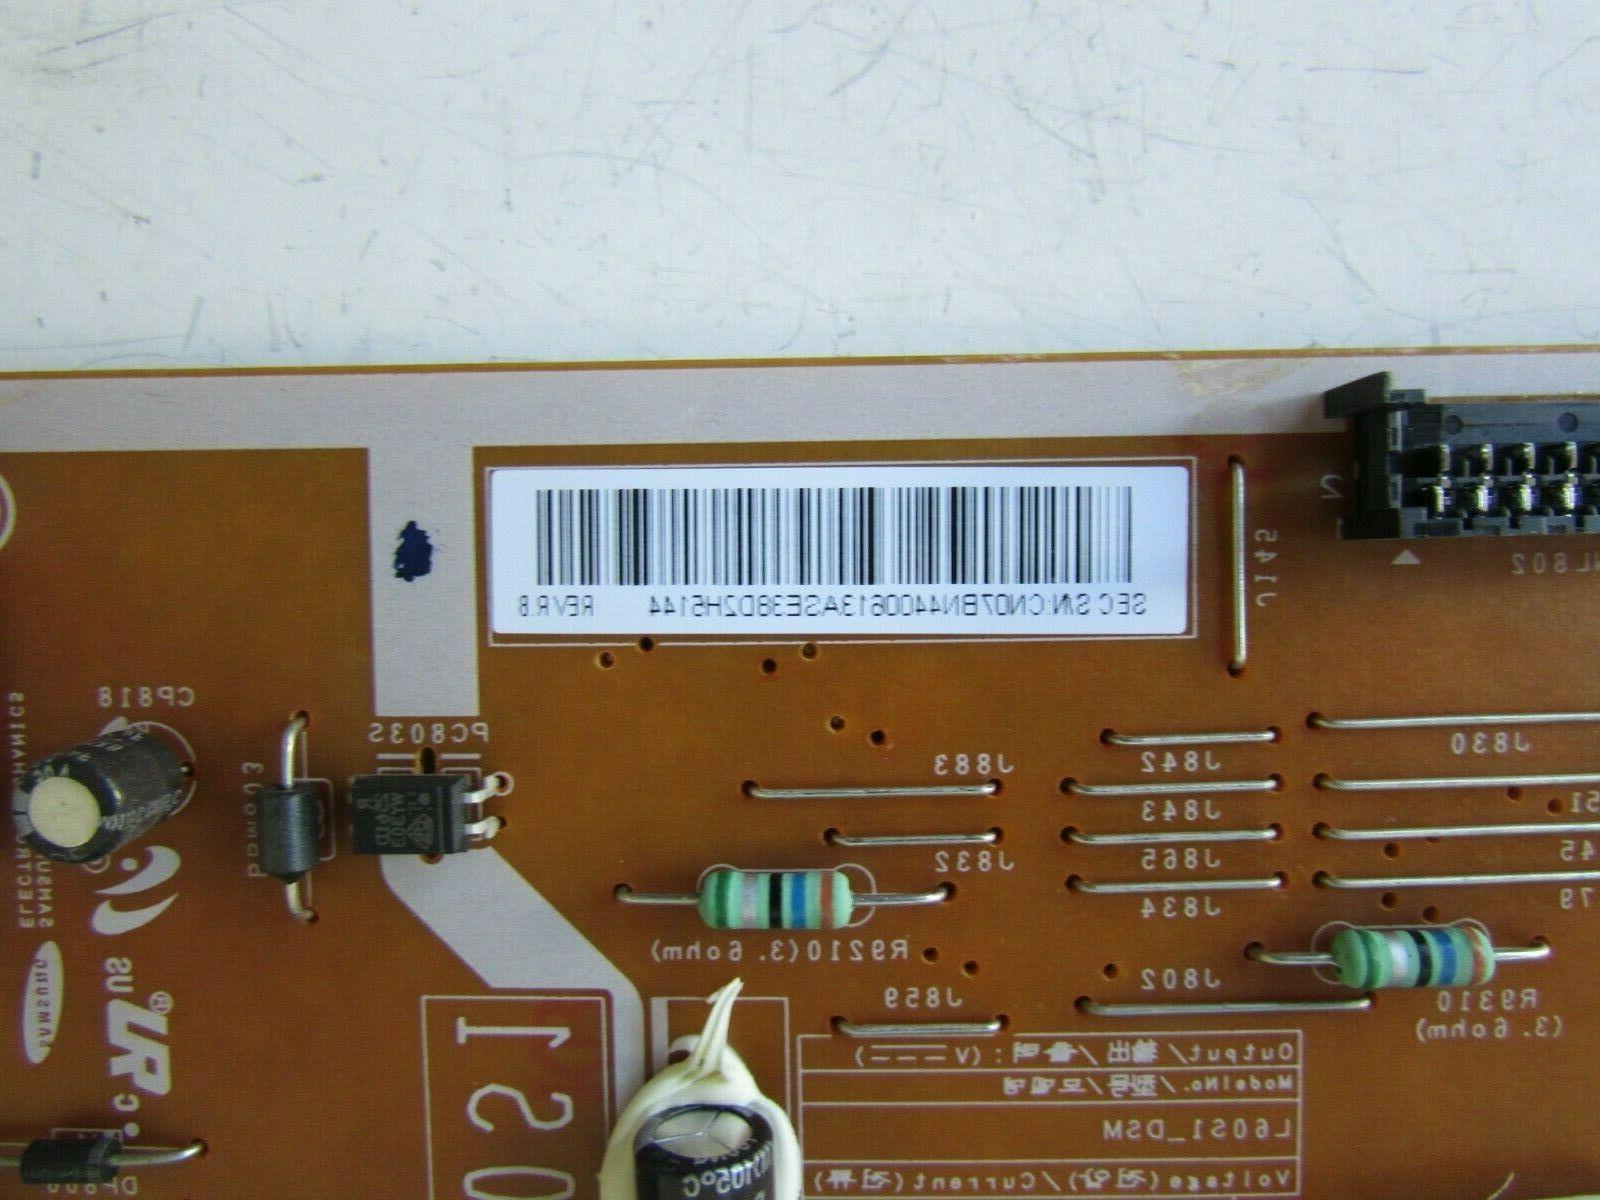 SAMSUNG UN60F6300AFXZC UN60F6300AFXZA POWER